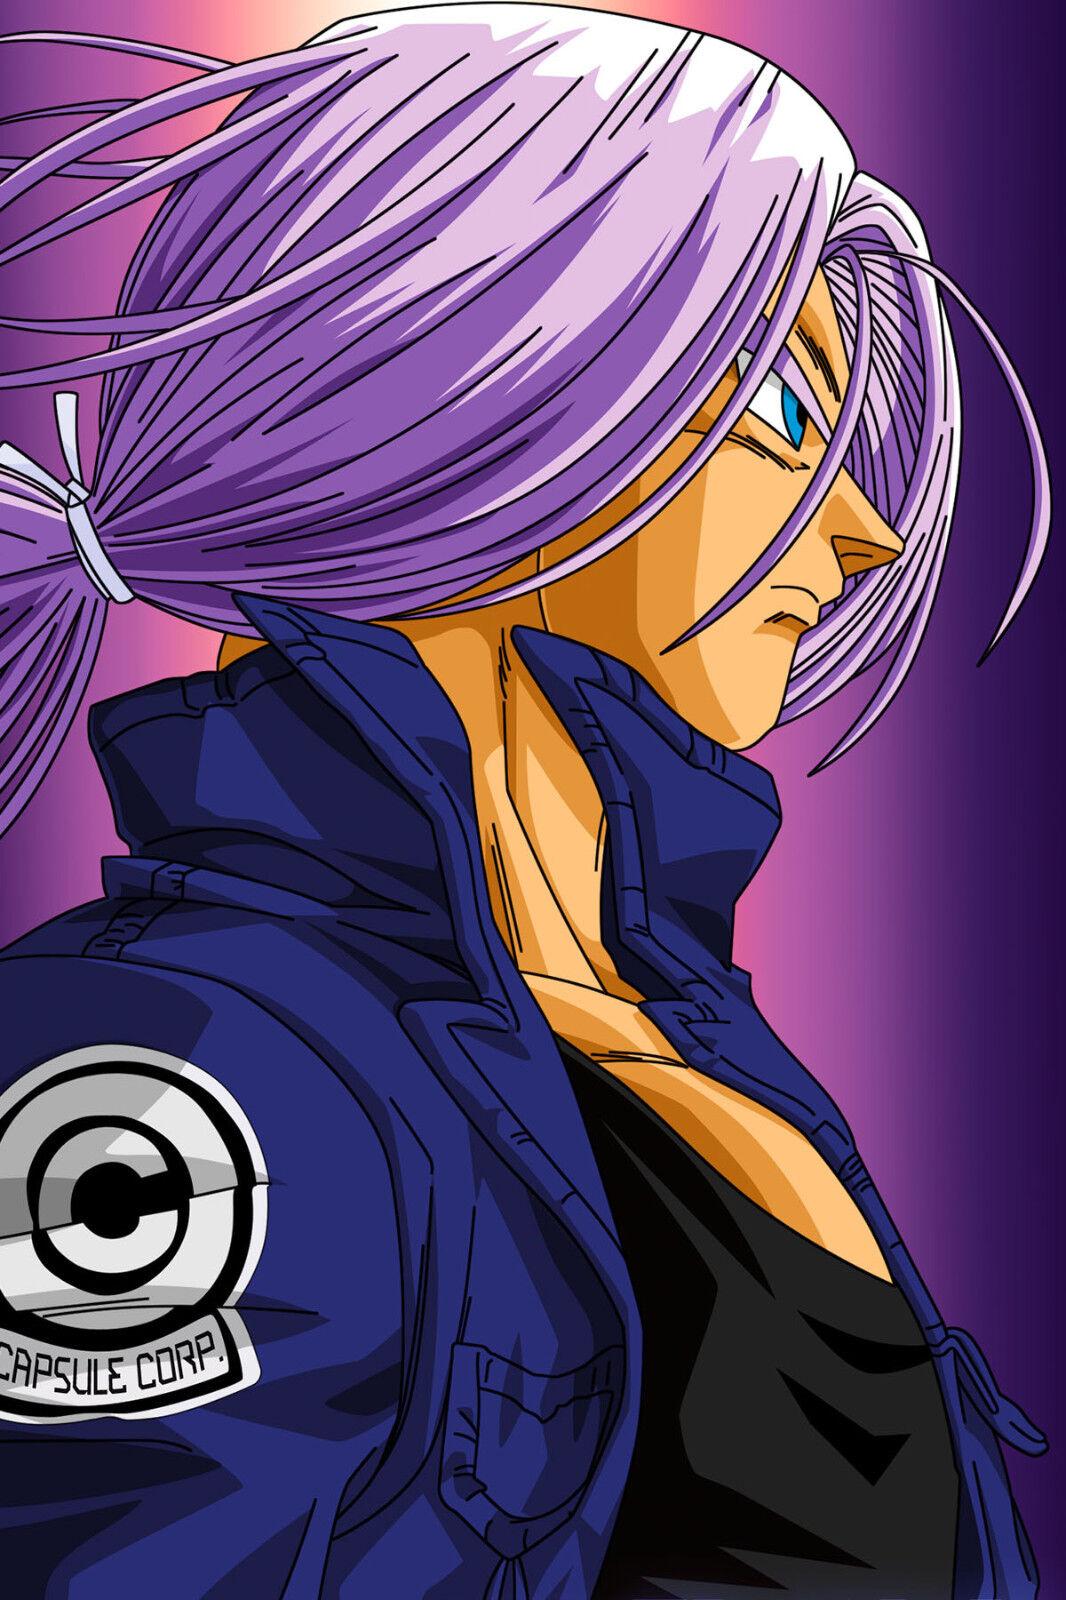 Dragon Ball Z Poster SSJ3 Goku Kicking 18inx12in Free Shipping